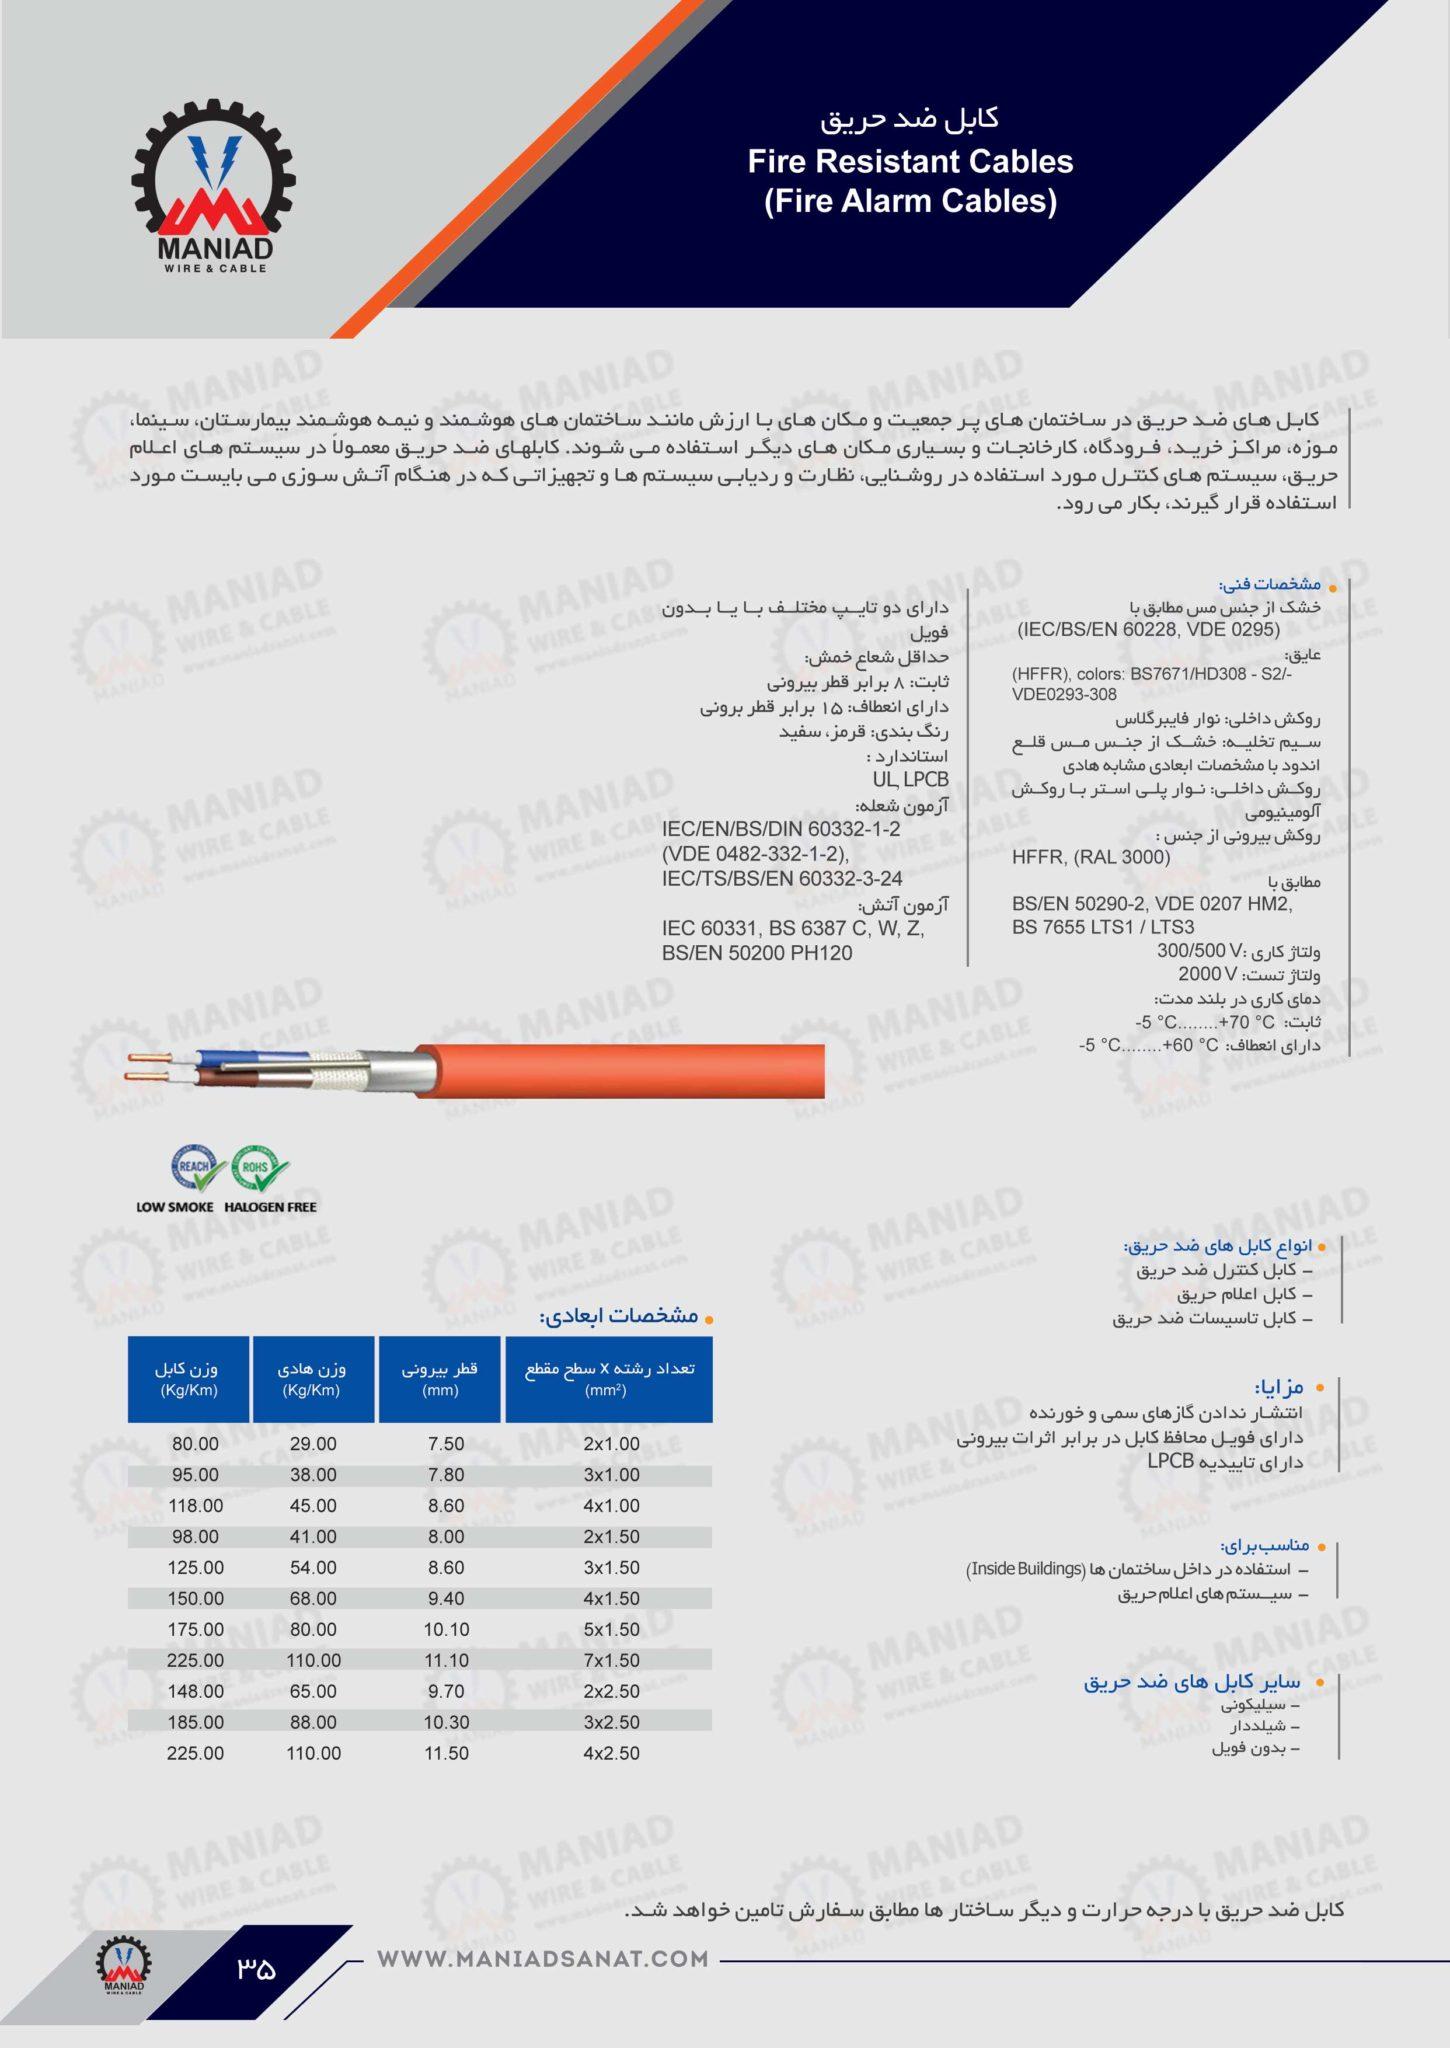 کابل ضد حریق سیلیکونی - دیتاشیت